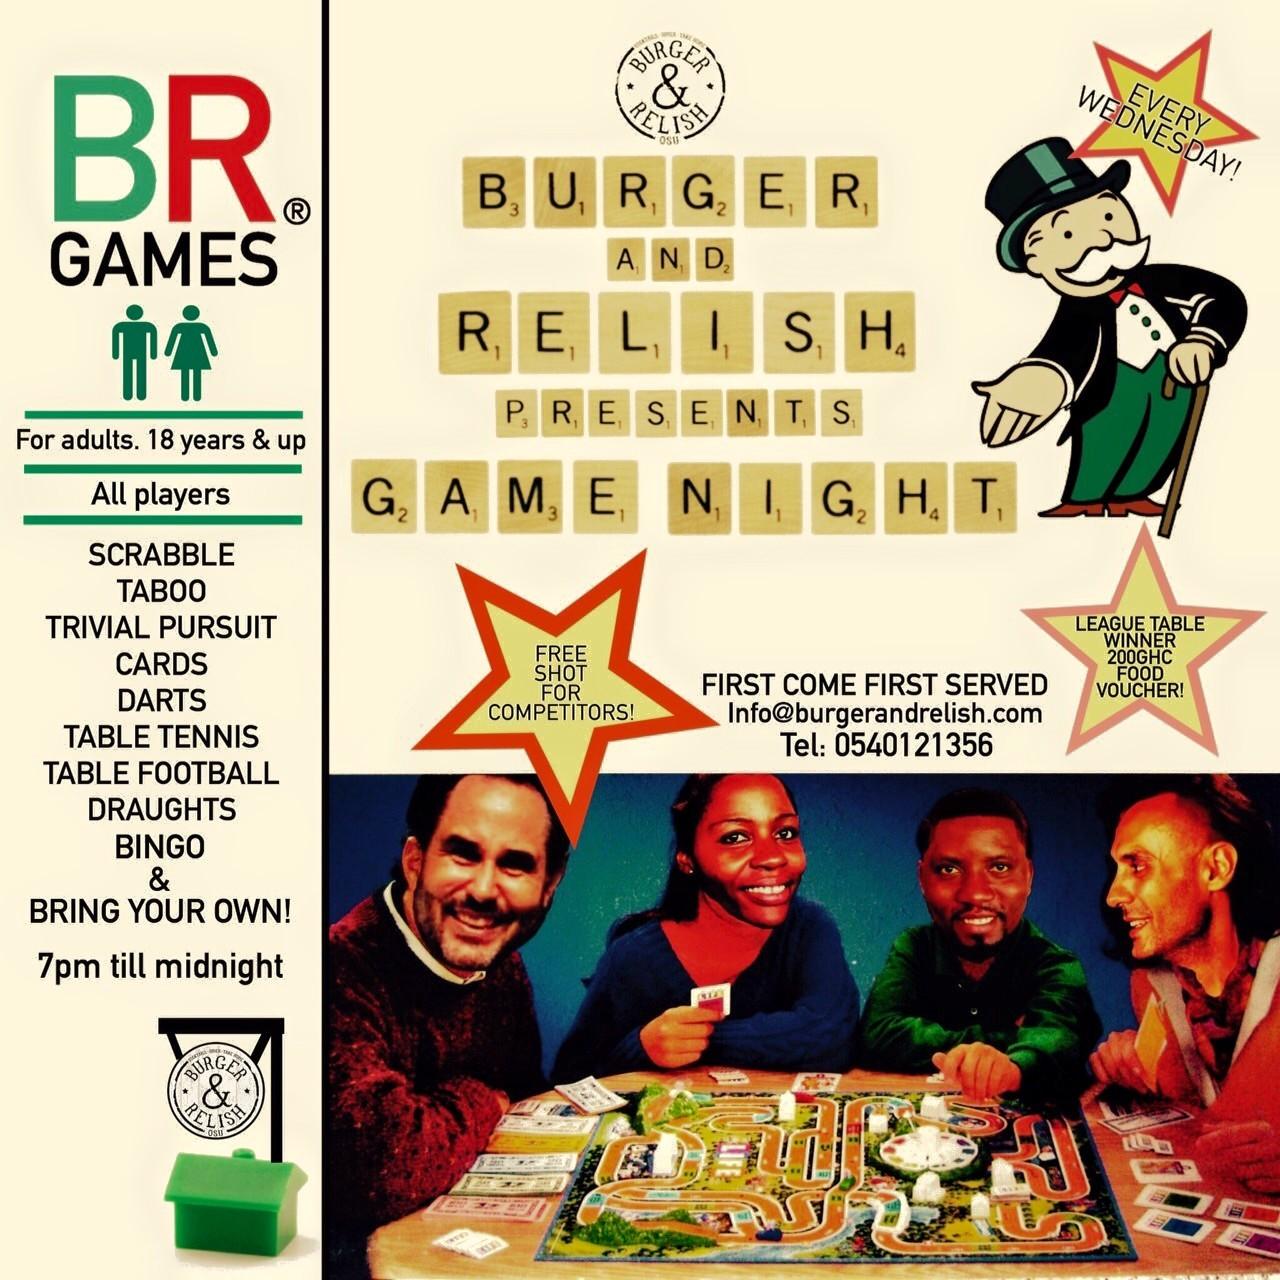 Games night at Burger & Relish | Wednesdays